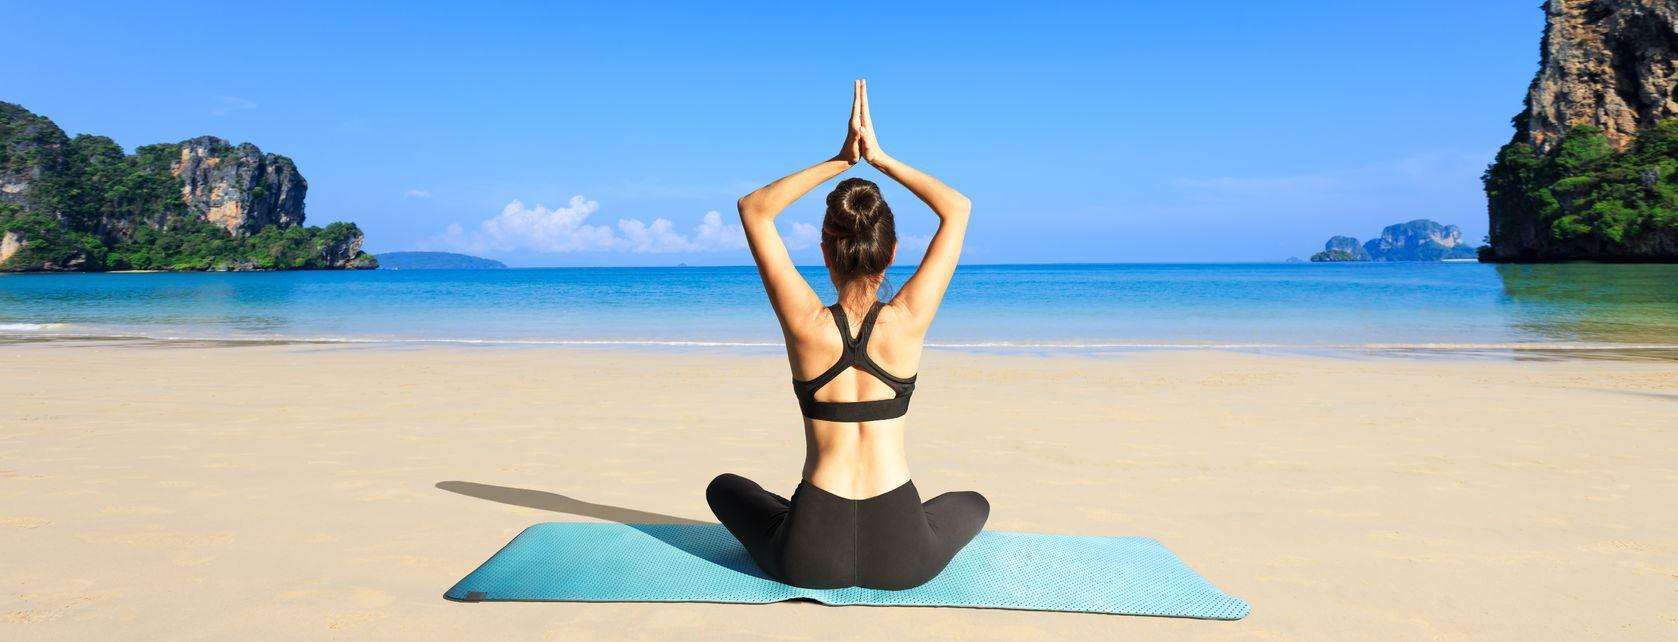 27874078 - yoga woman on sea coast